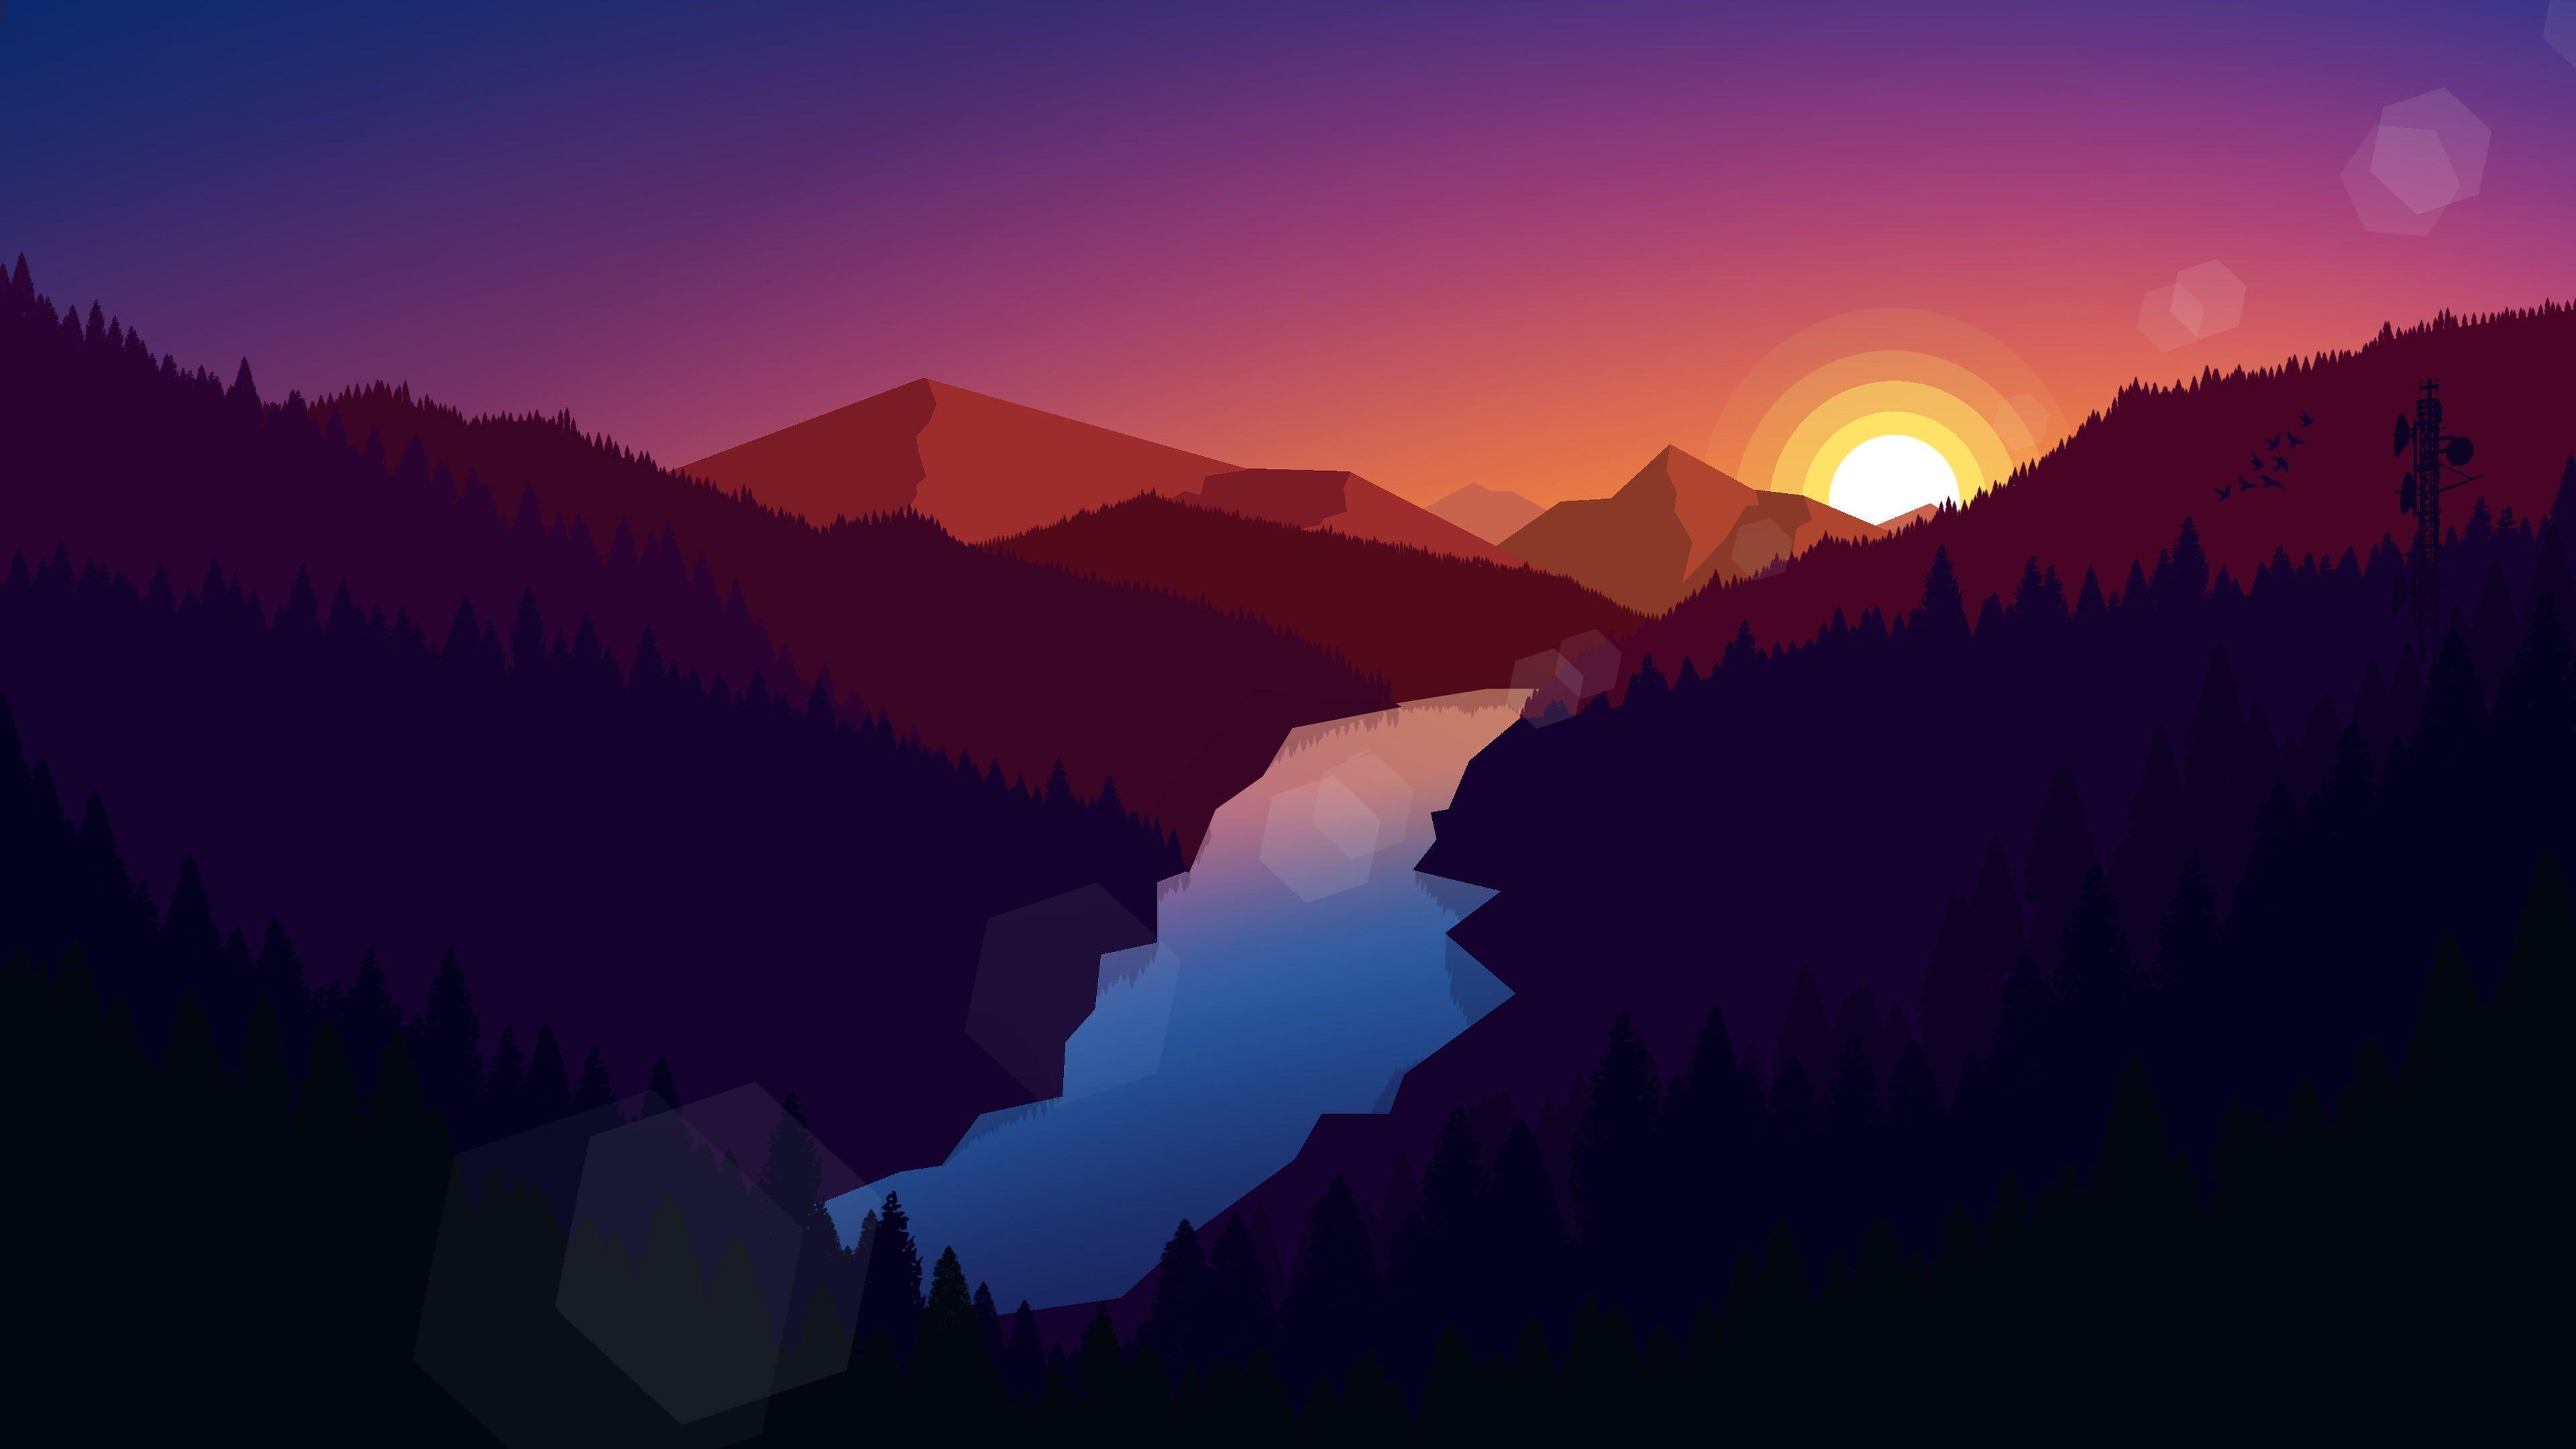 Illustration Landscape Mountains Nature Sunset River Digital Art In 2020 Desktop Wallpaper Art Minimalist Desktop Wallpaper Desktop Wallpaper